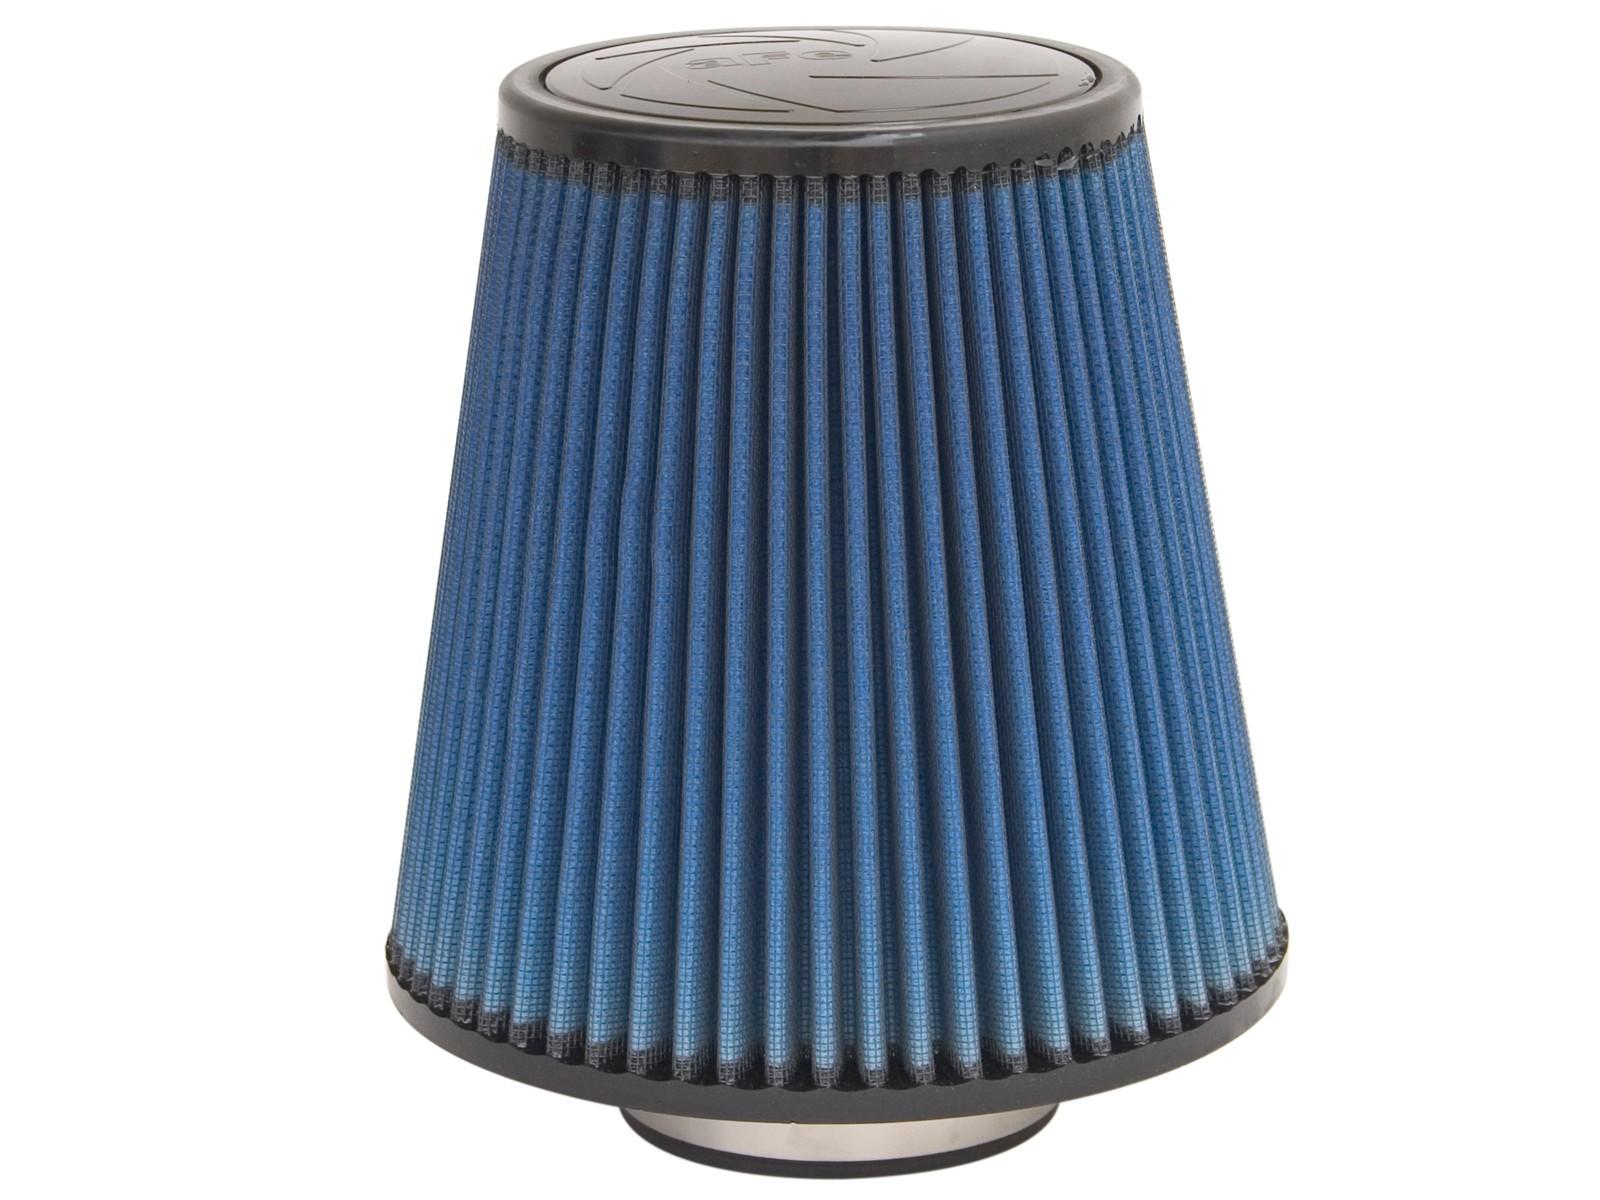 aFe POWER 24-90018 Magnum FLOW Pro 5R Air Filter